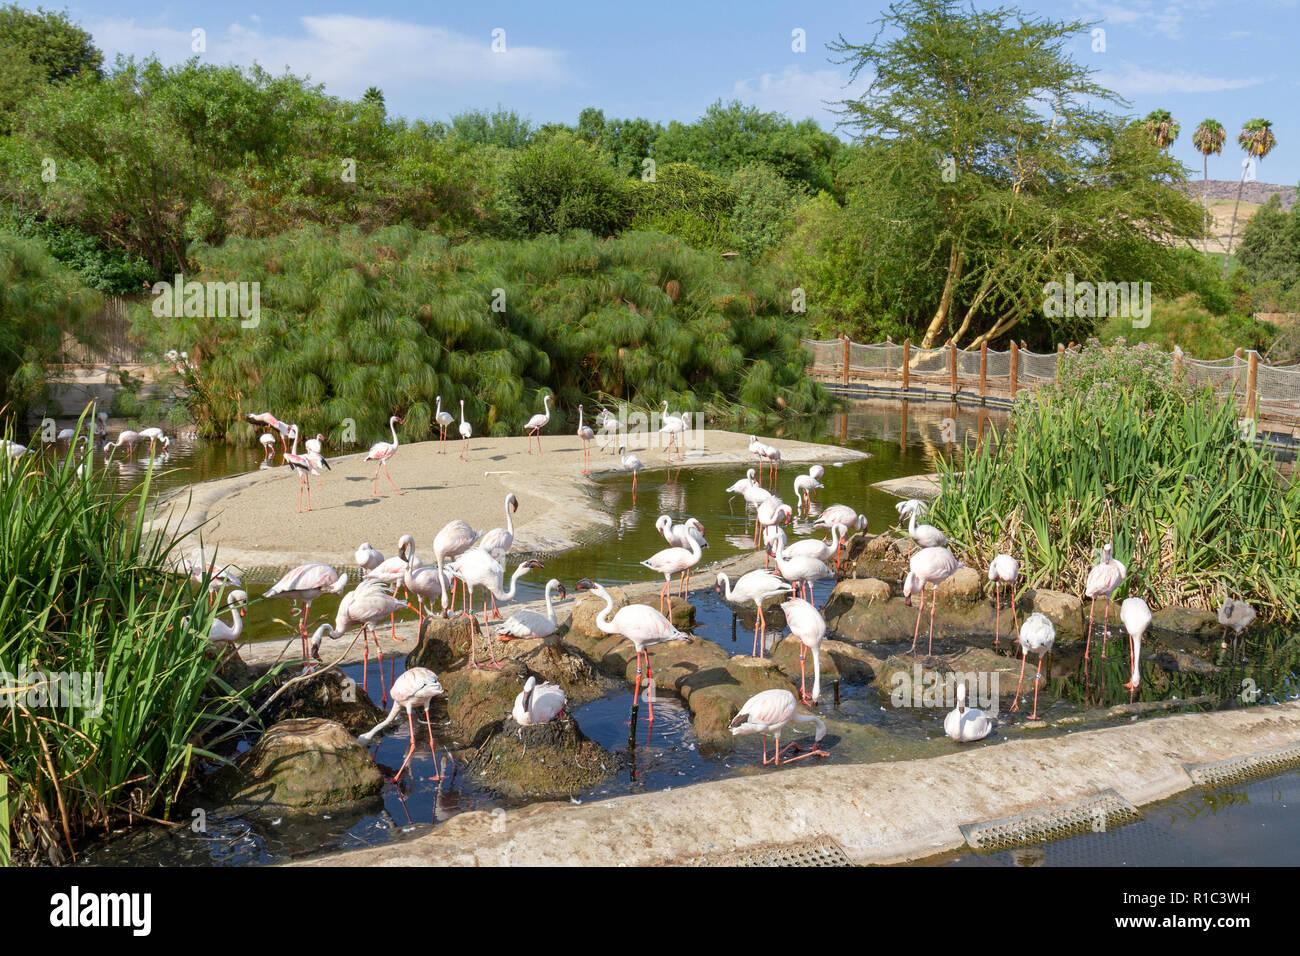 Lesser Flamingos (phoeniconaias minor) in the San Diego Zoo Safari Park, Escondido, CA, United States Stock Photo